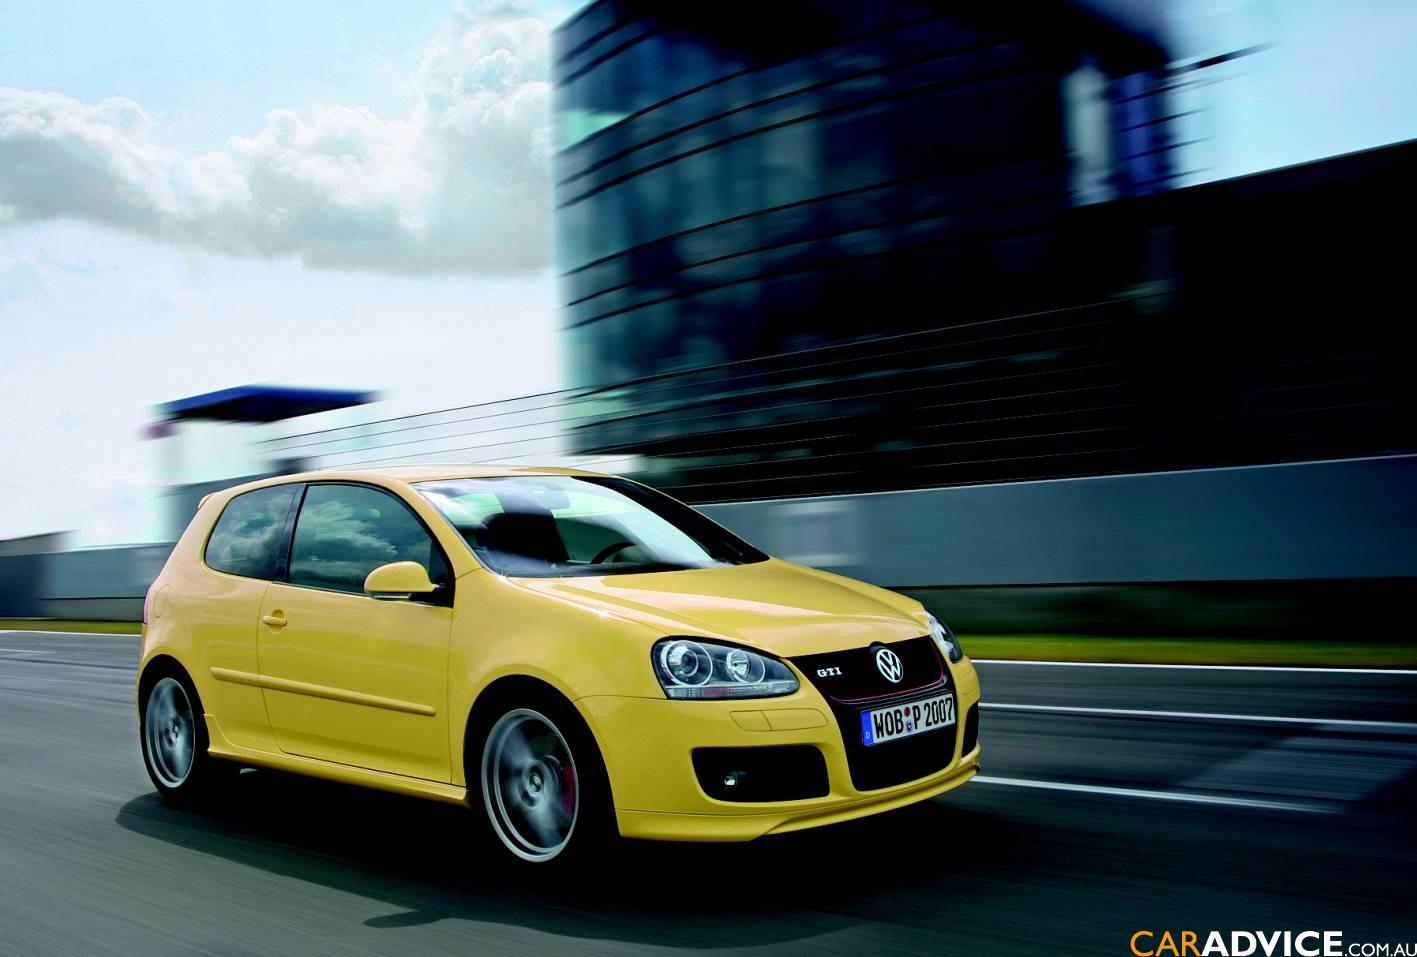 Volkswagen Golf Gti Pirelli Edition Photos Caradvice